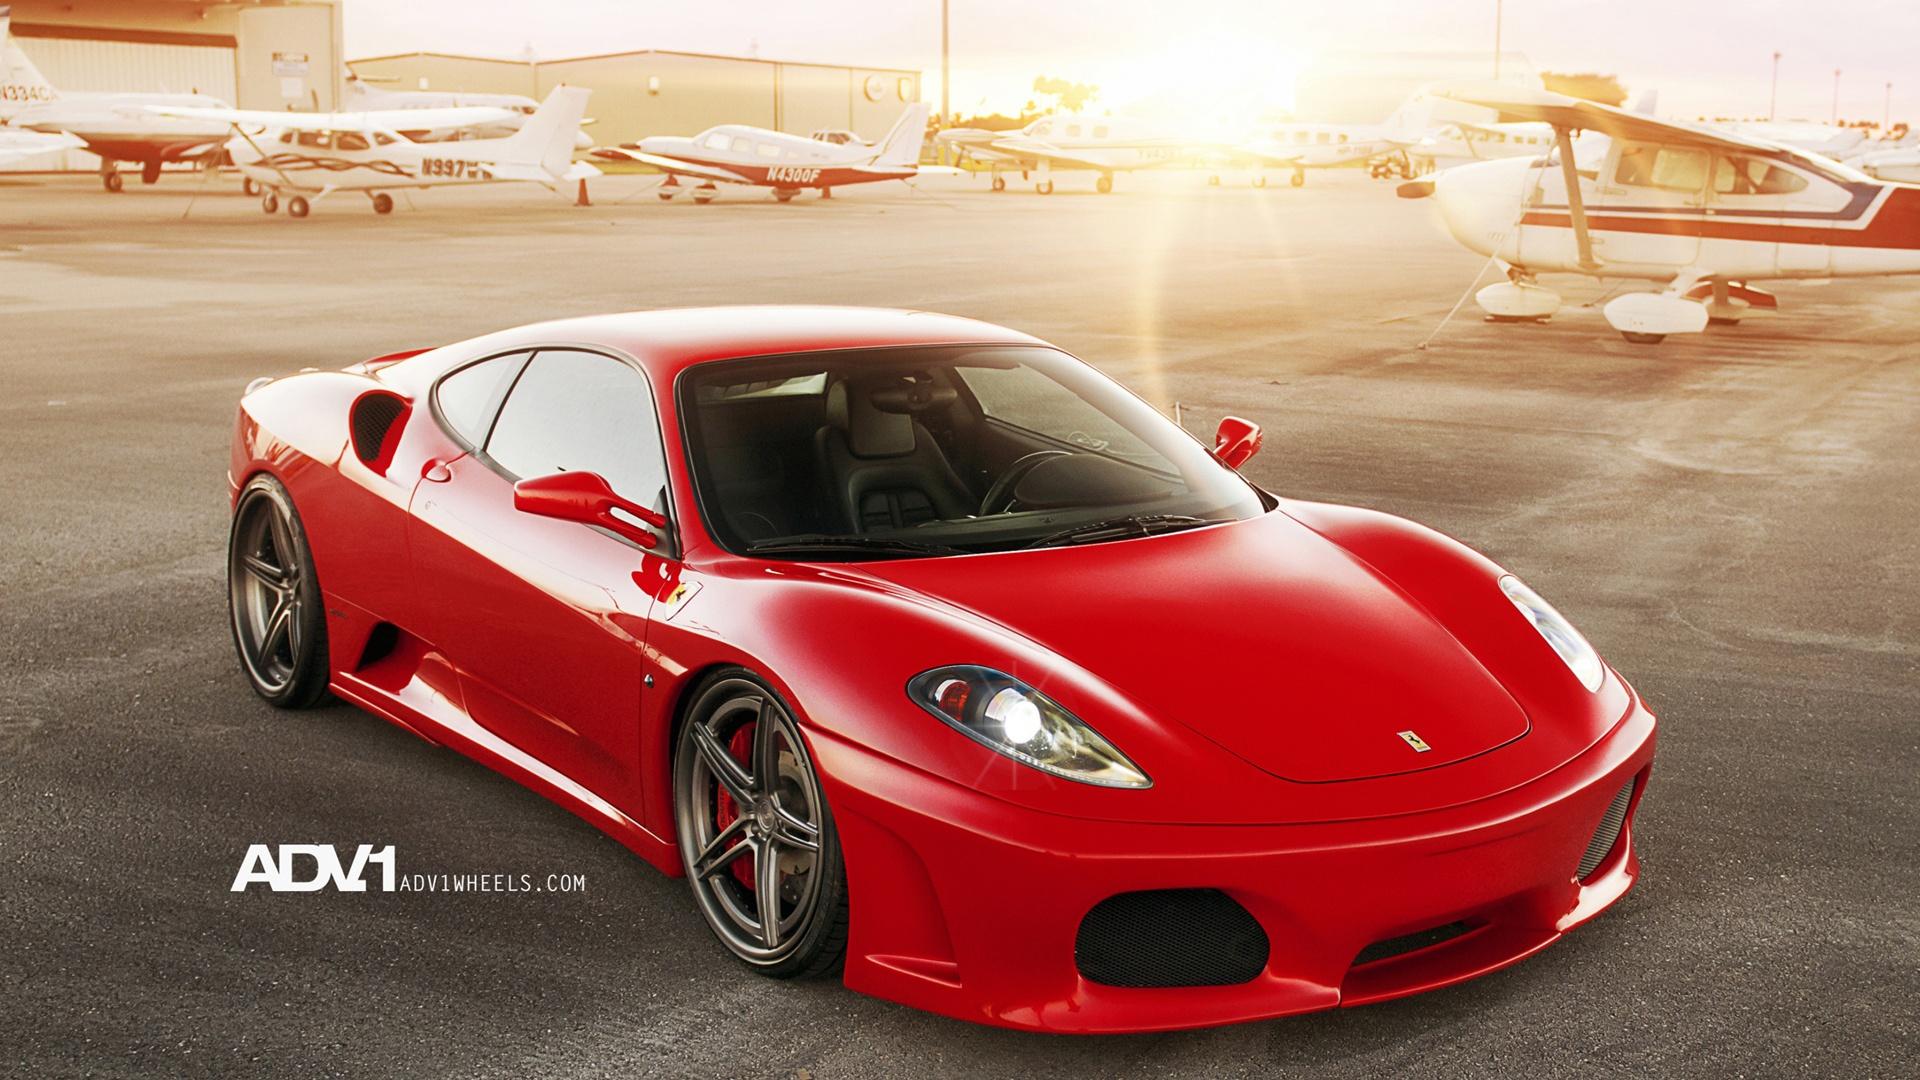 Ferrari F430 Adv1 Wallpapers In Jpg Format For Free Download